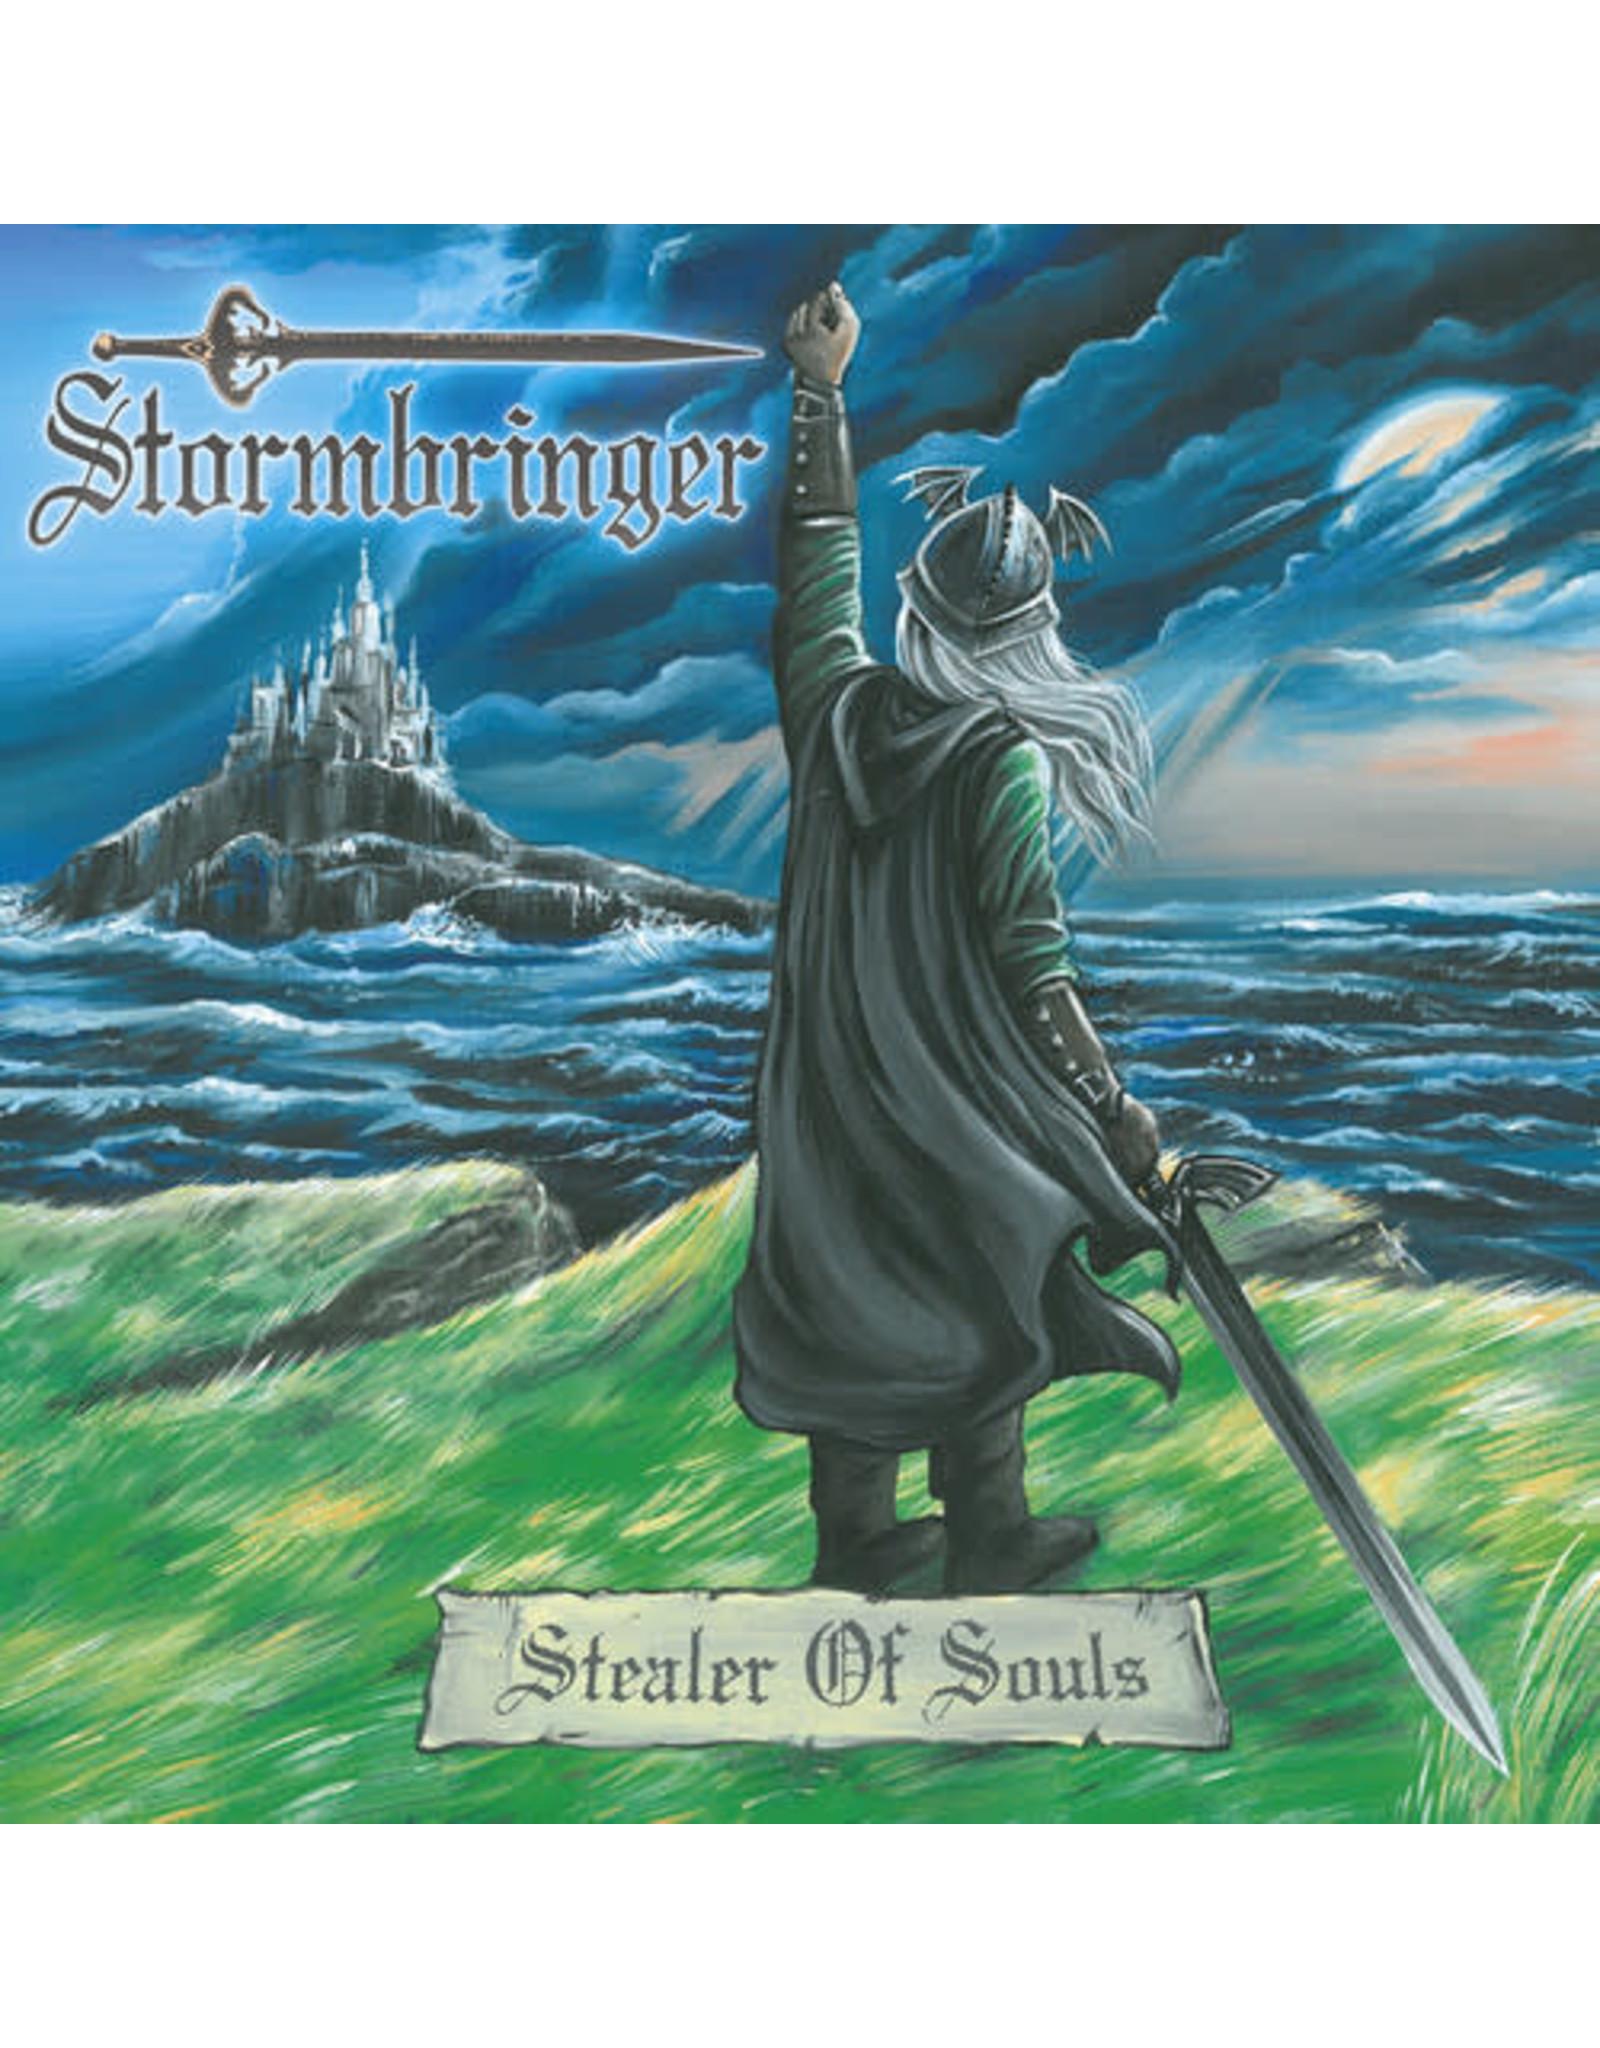 New Vinyl Stormbringer - Stealer Of Souls LP